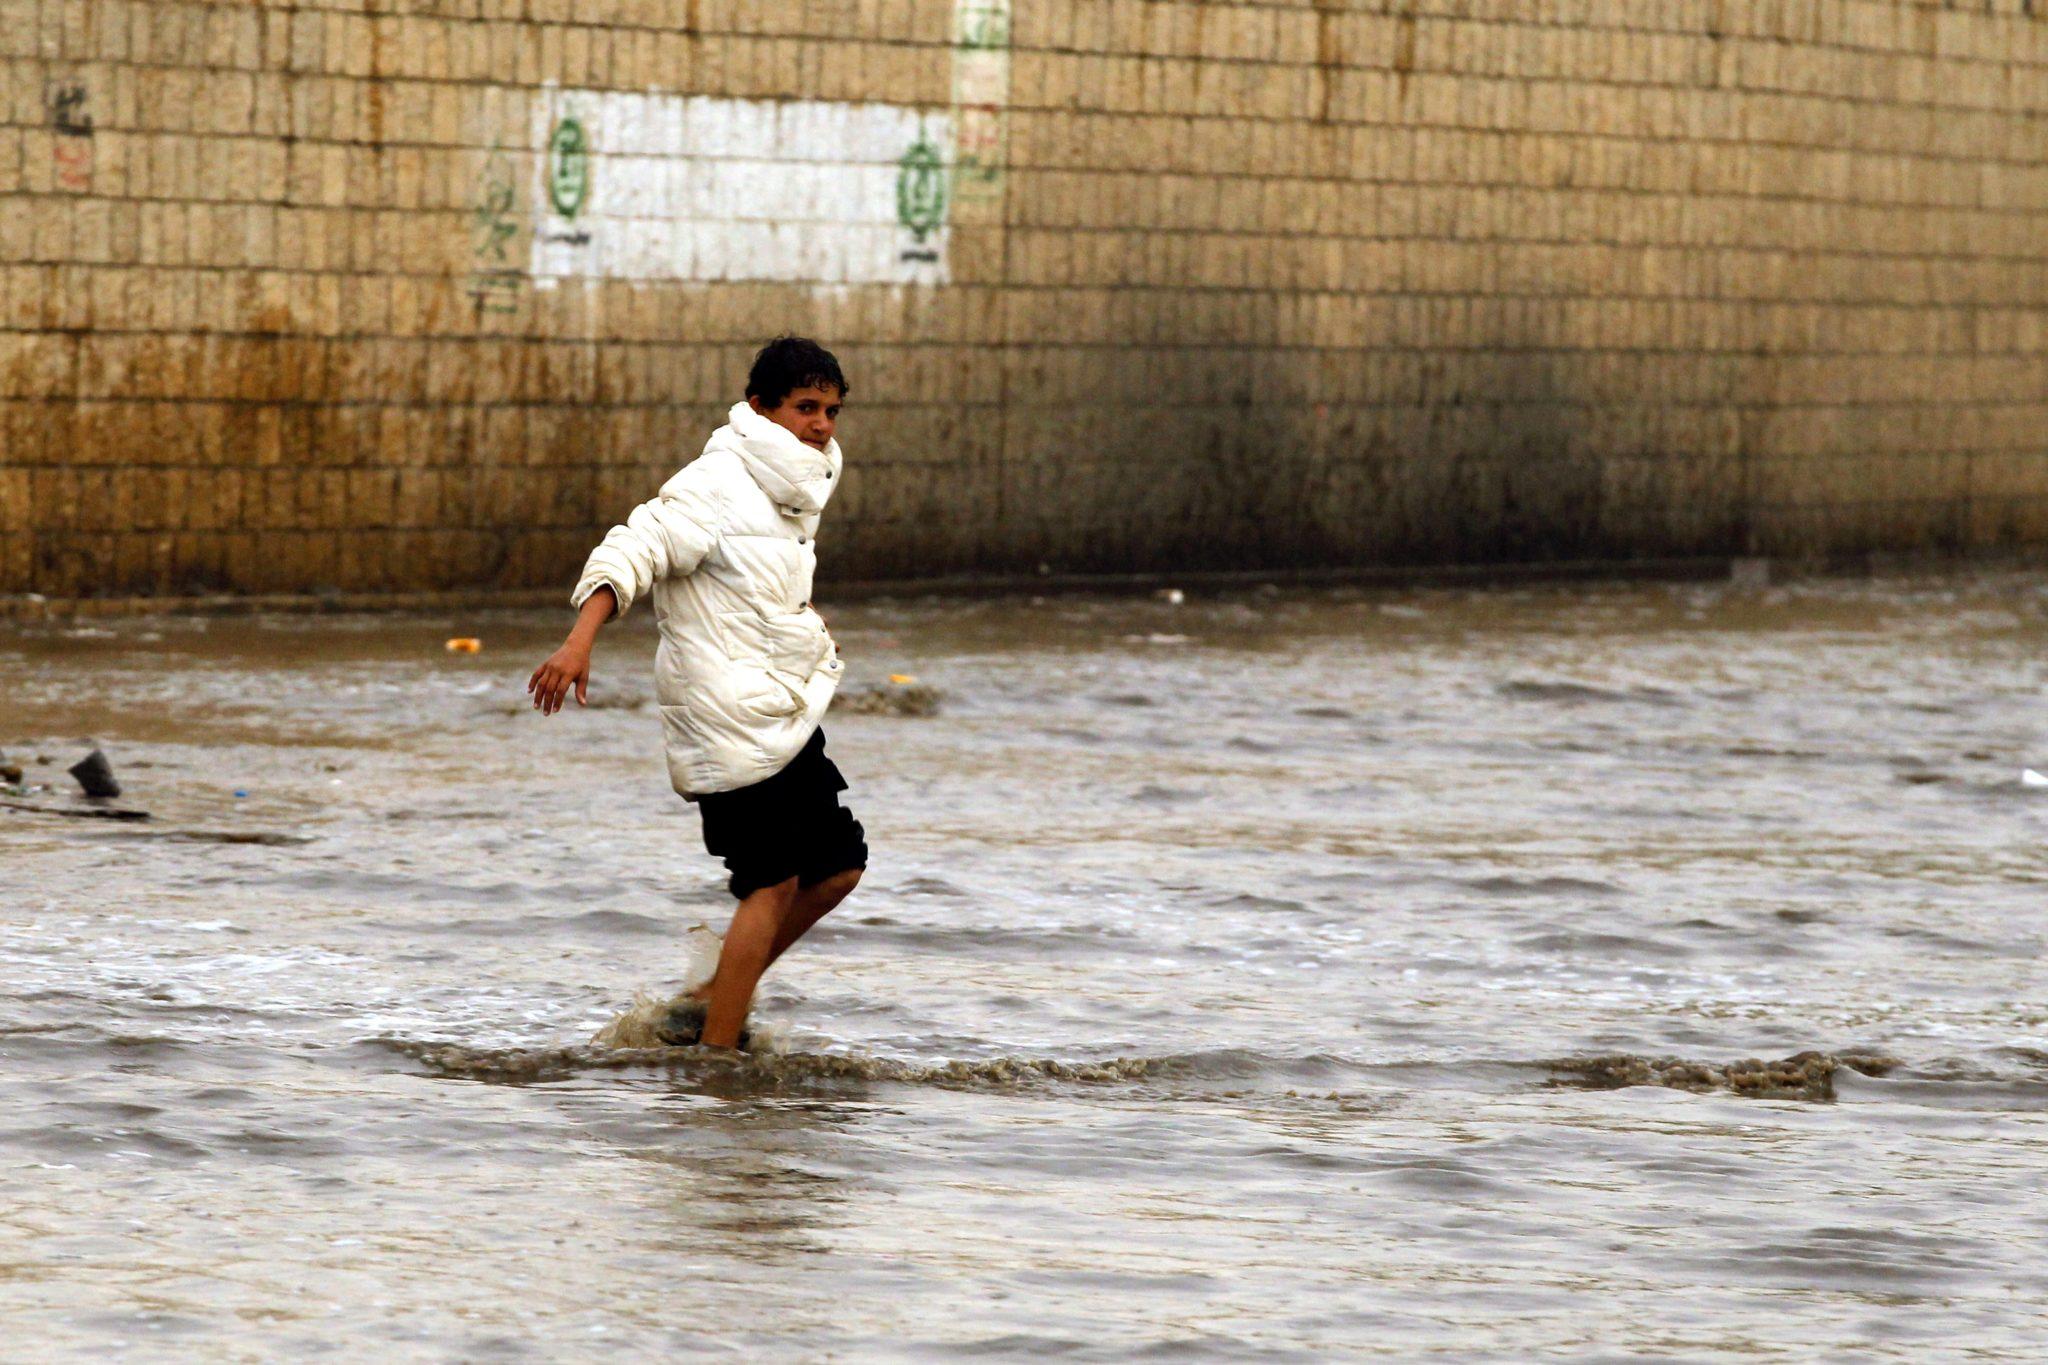 Jemen, Sana: ulewne deszcze i podtopienia, fot: Yahya Arhab, PAP/EPA